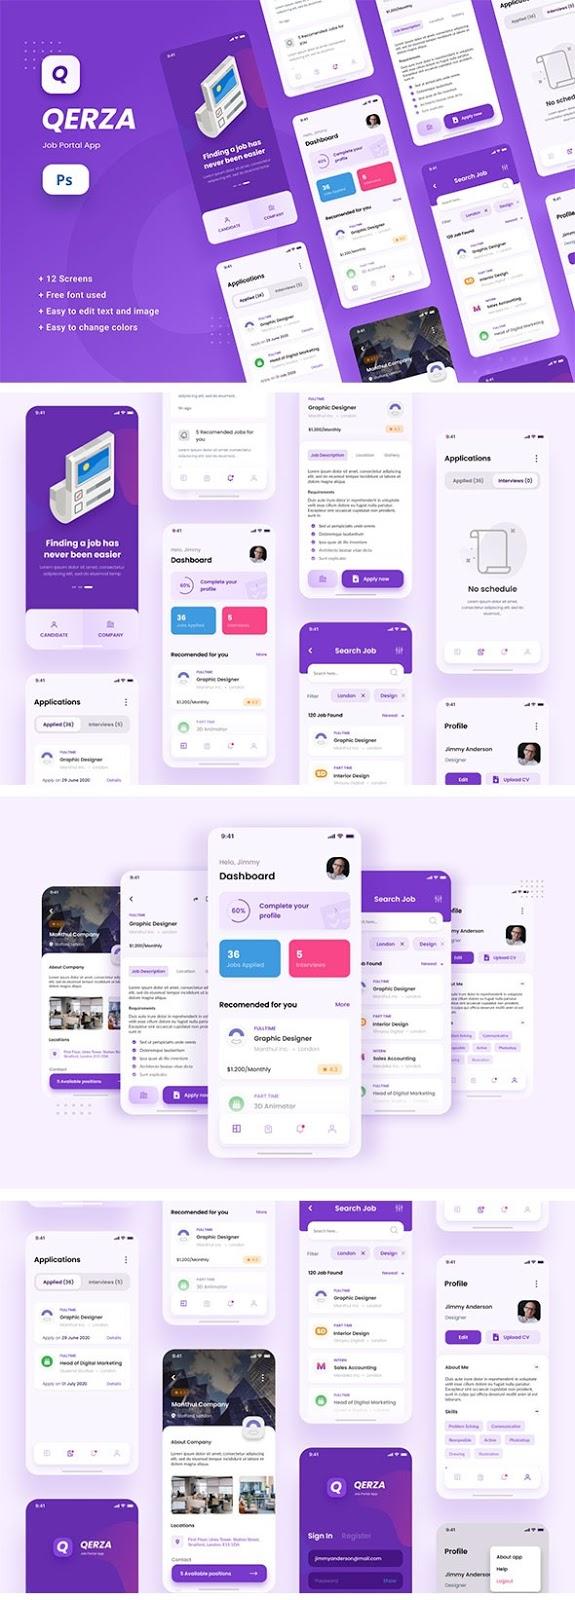 Job Portal iOS App Design Template